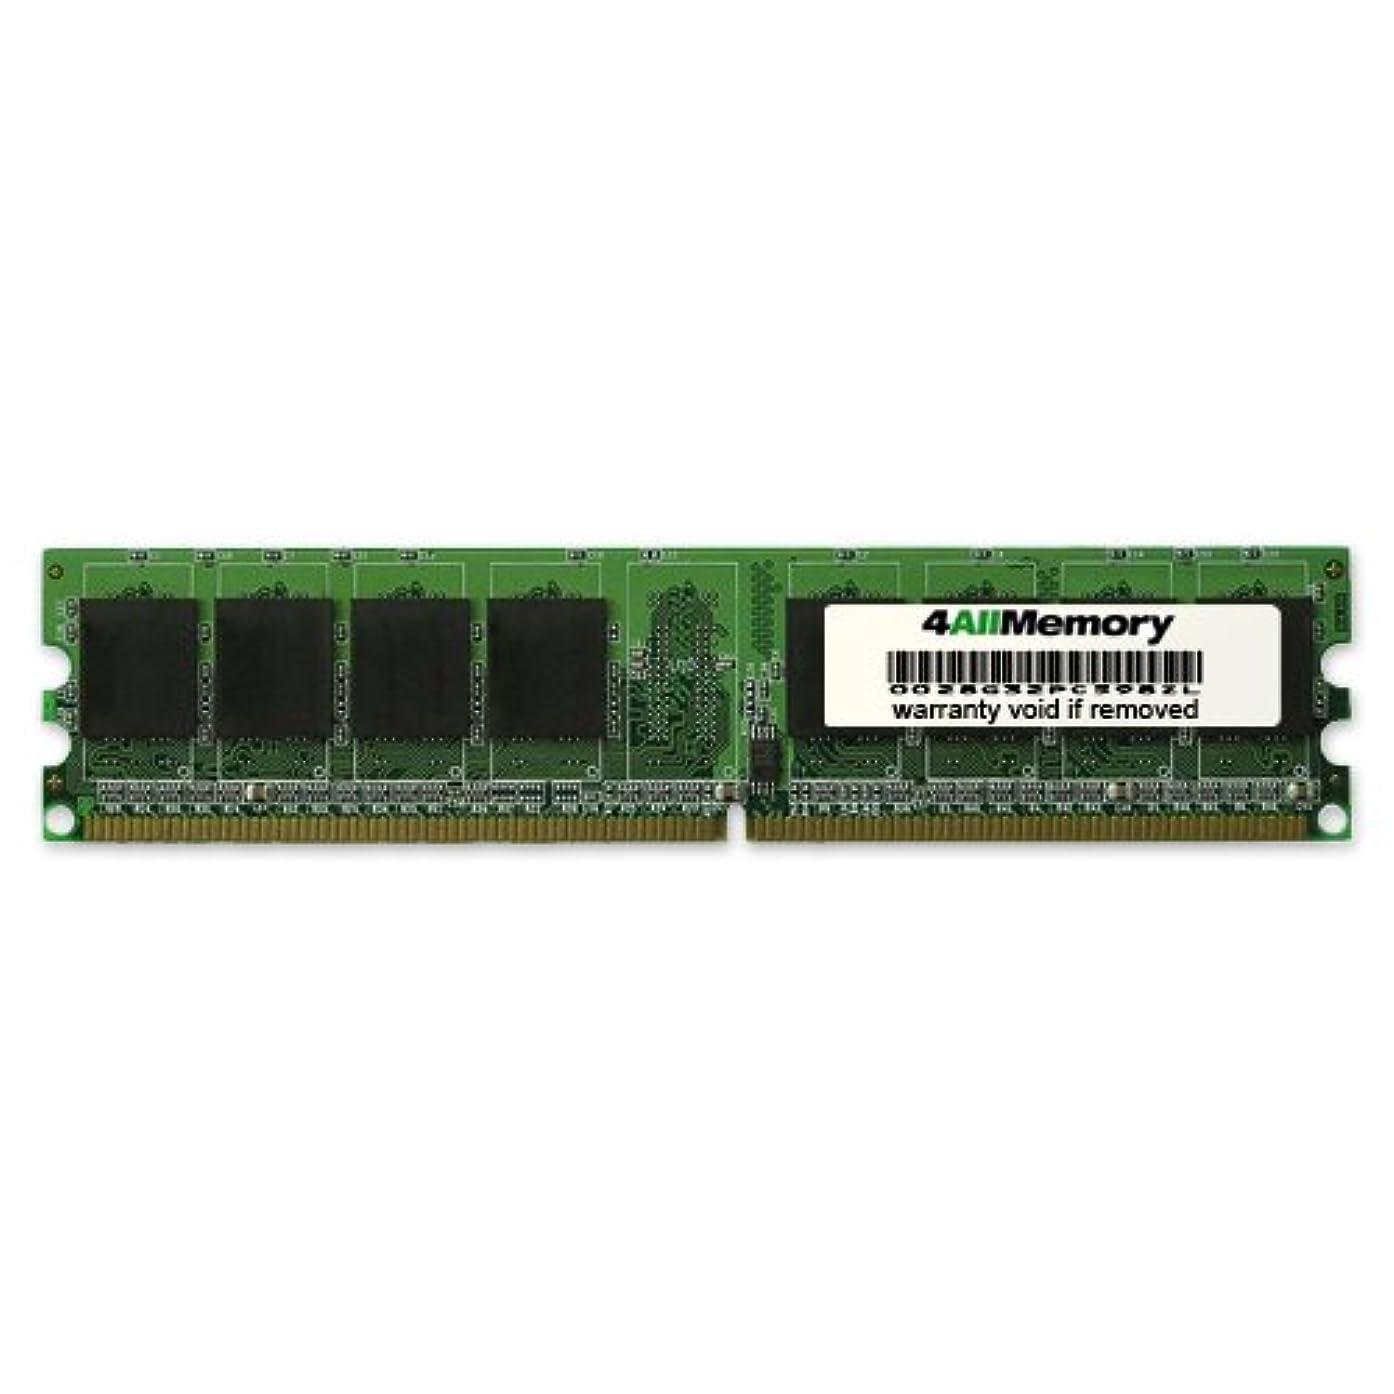 2GB DDR2-667 (PC2-5300) RAM Memory Upgrade for The ASUS P5 Series P5KPL-cm